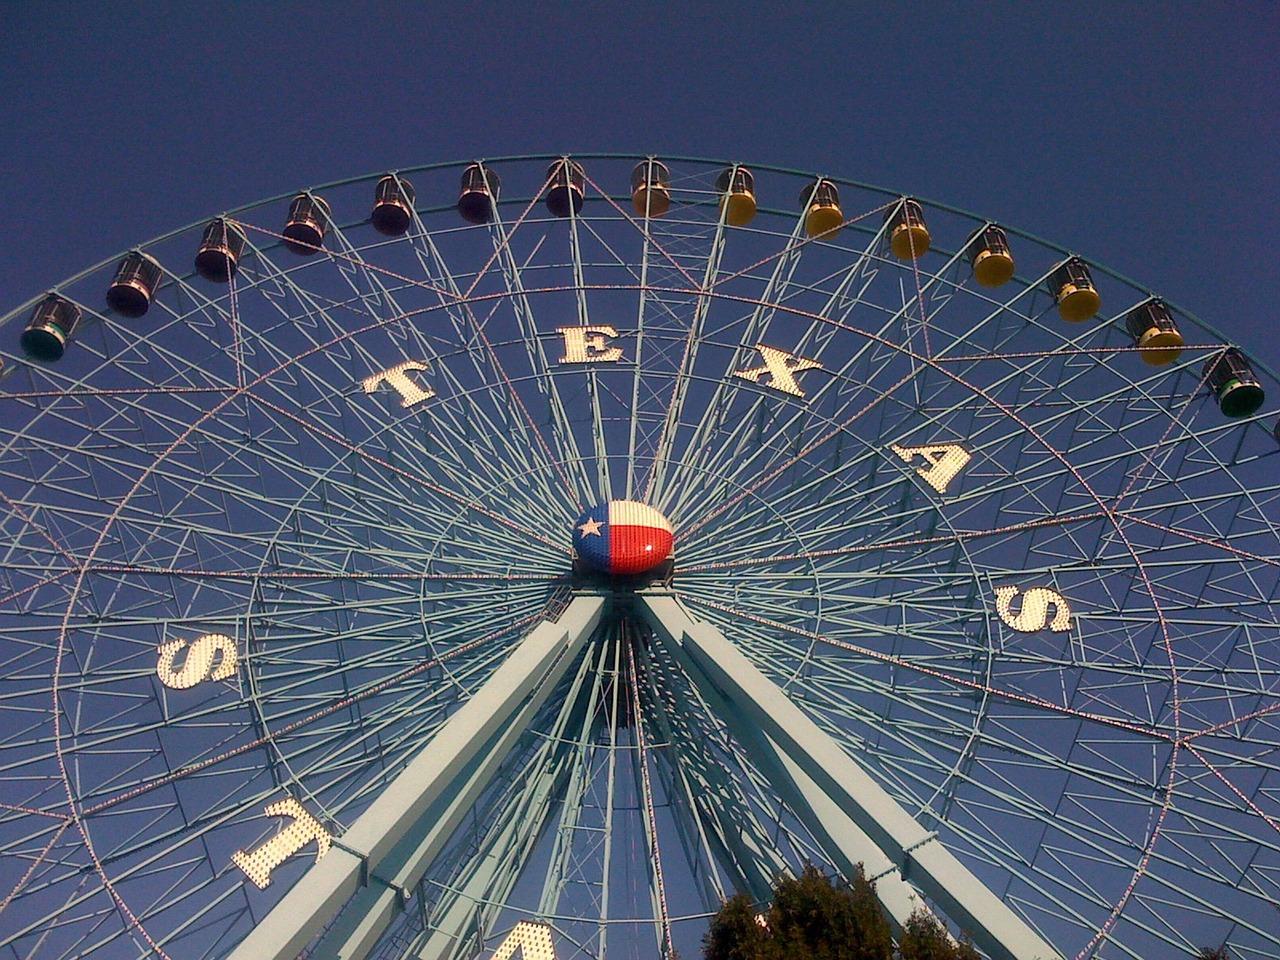 State Fair of Texas | © grayartist/Pixabay